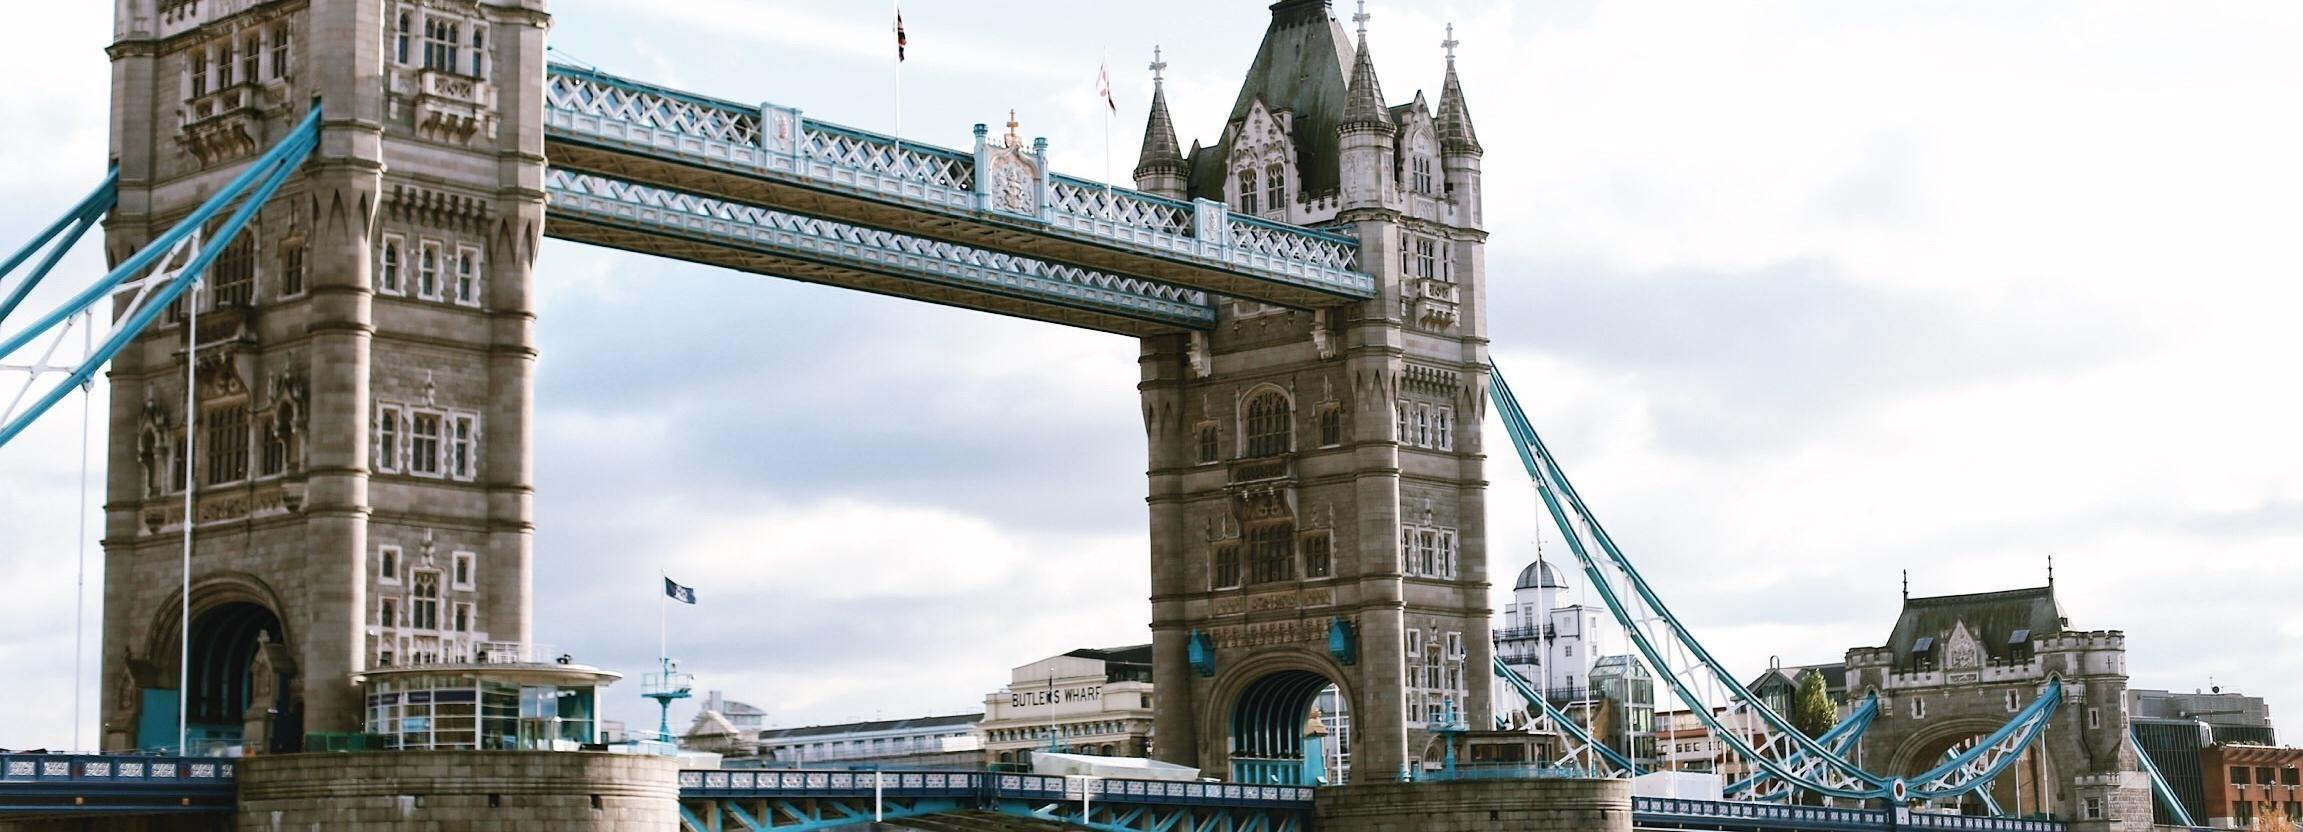 Londra: The Old City of London - Visita guidata a piedi